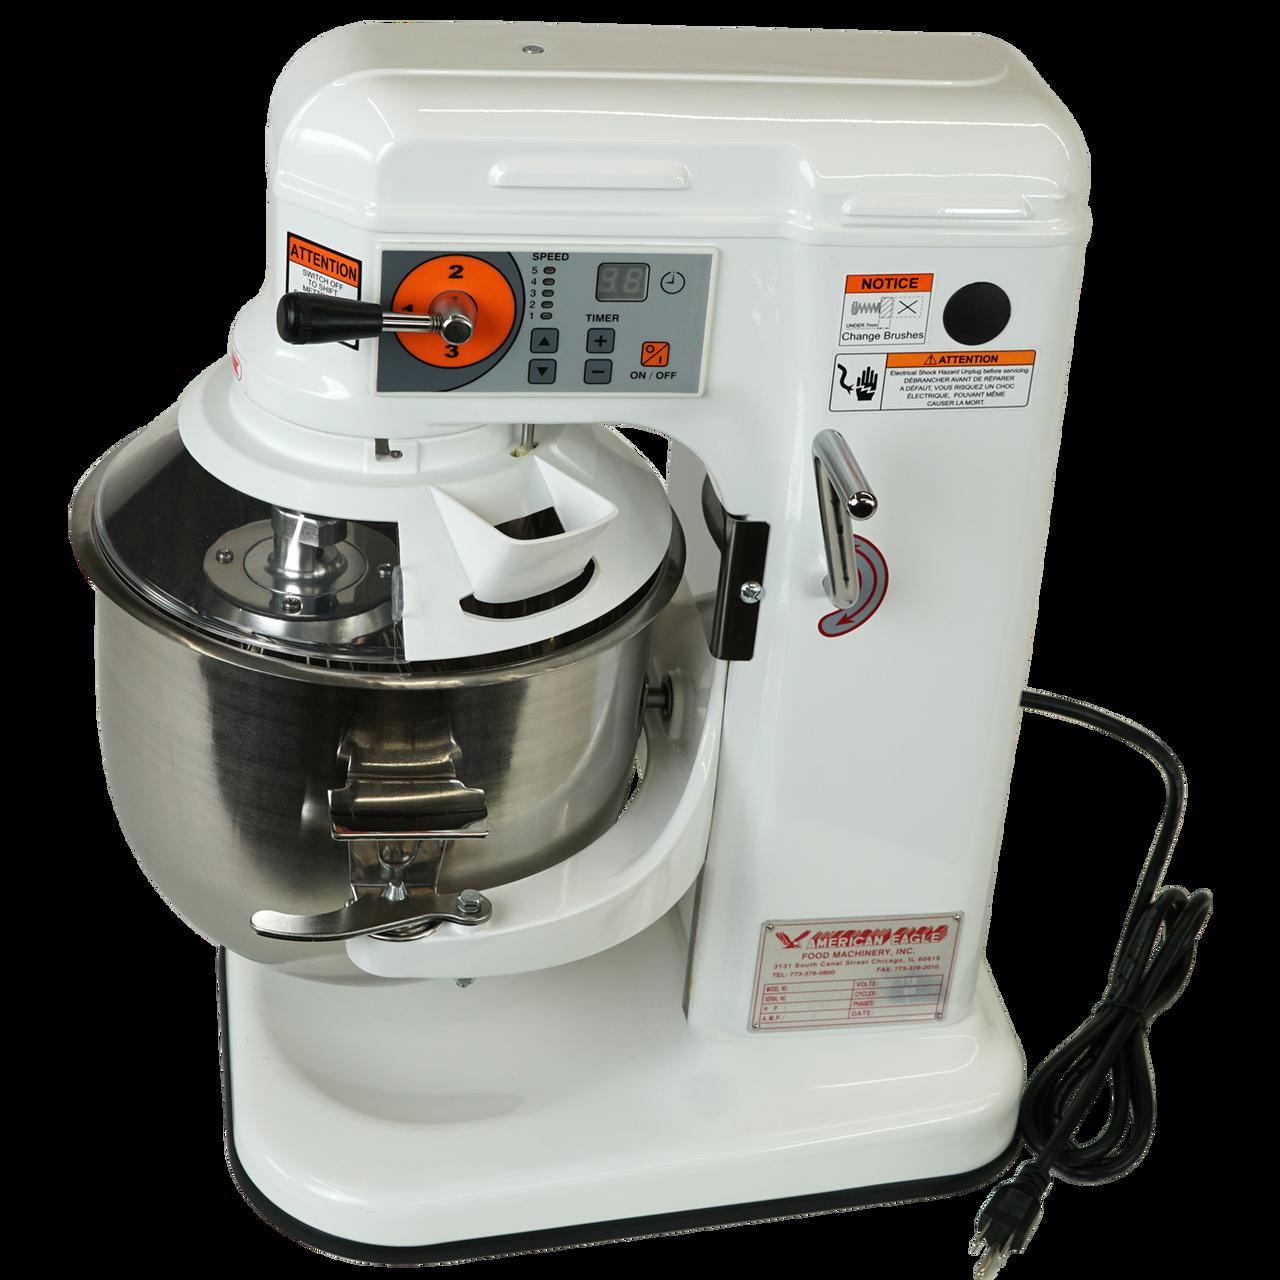 Power Cord, AE-10DCA 10 Quart Countertop Planetary Mixer, Commercial Mixer